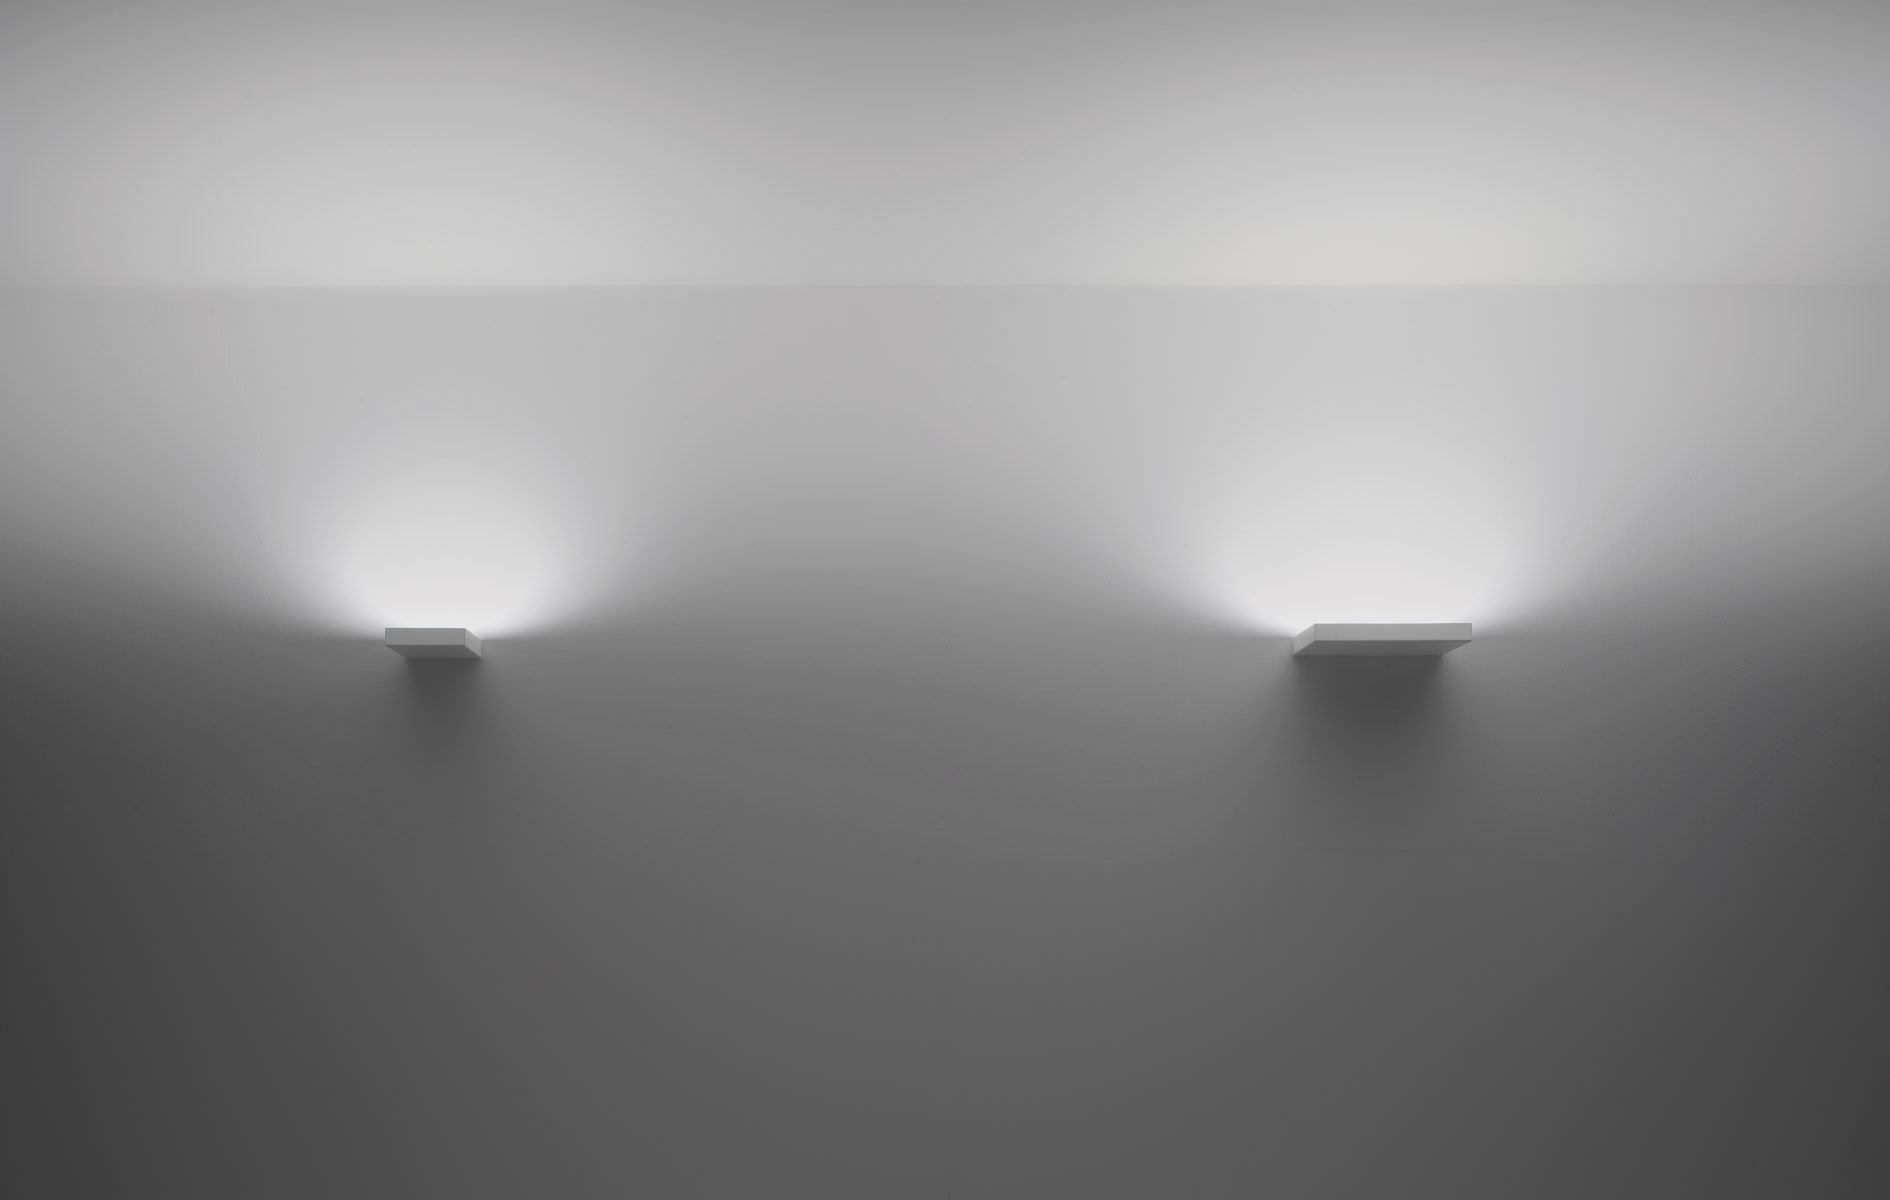 Applique quadrato led plafoniera led w applique quadrata cm luce